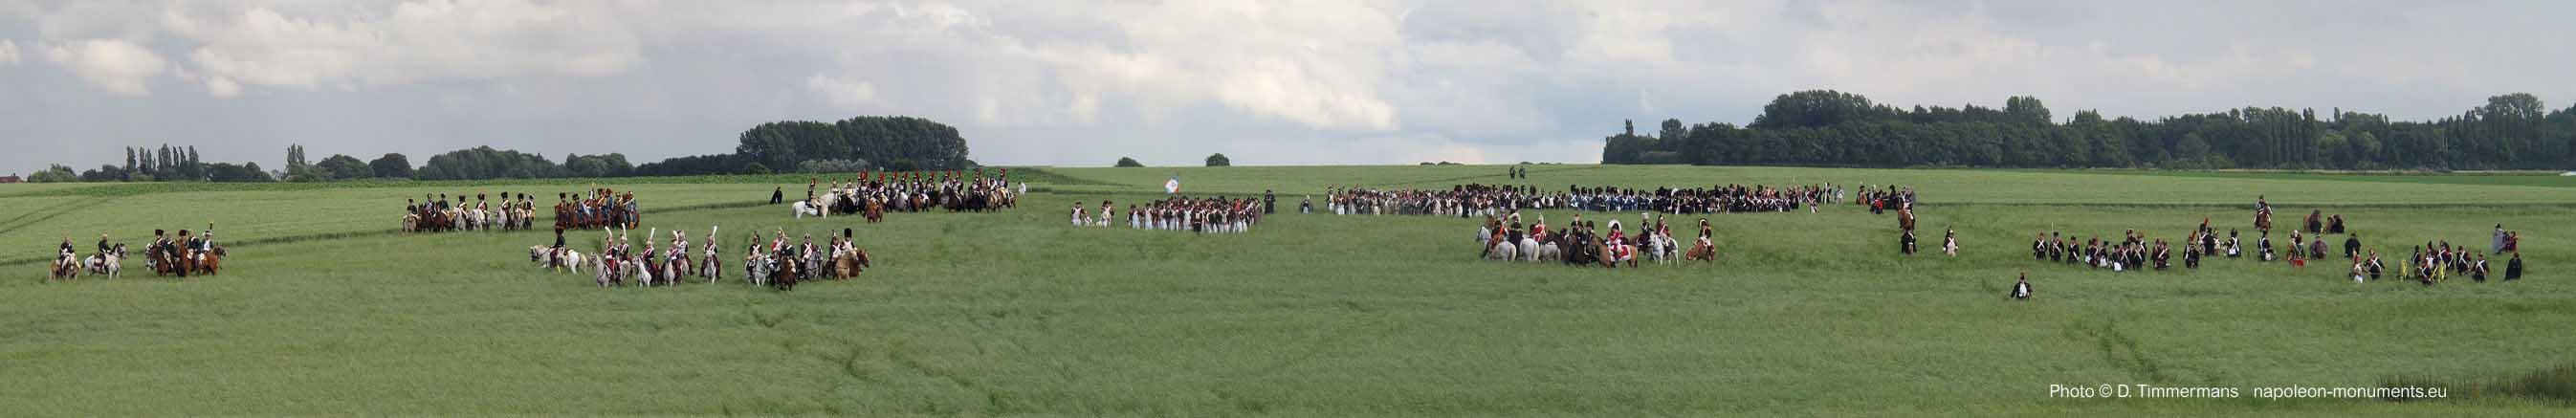 http://napoleon-monuments.eu/Napoleon1er/images/110618Goumont081PANO.jpg